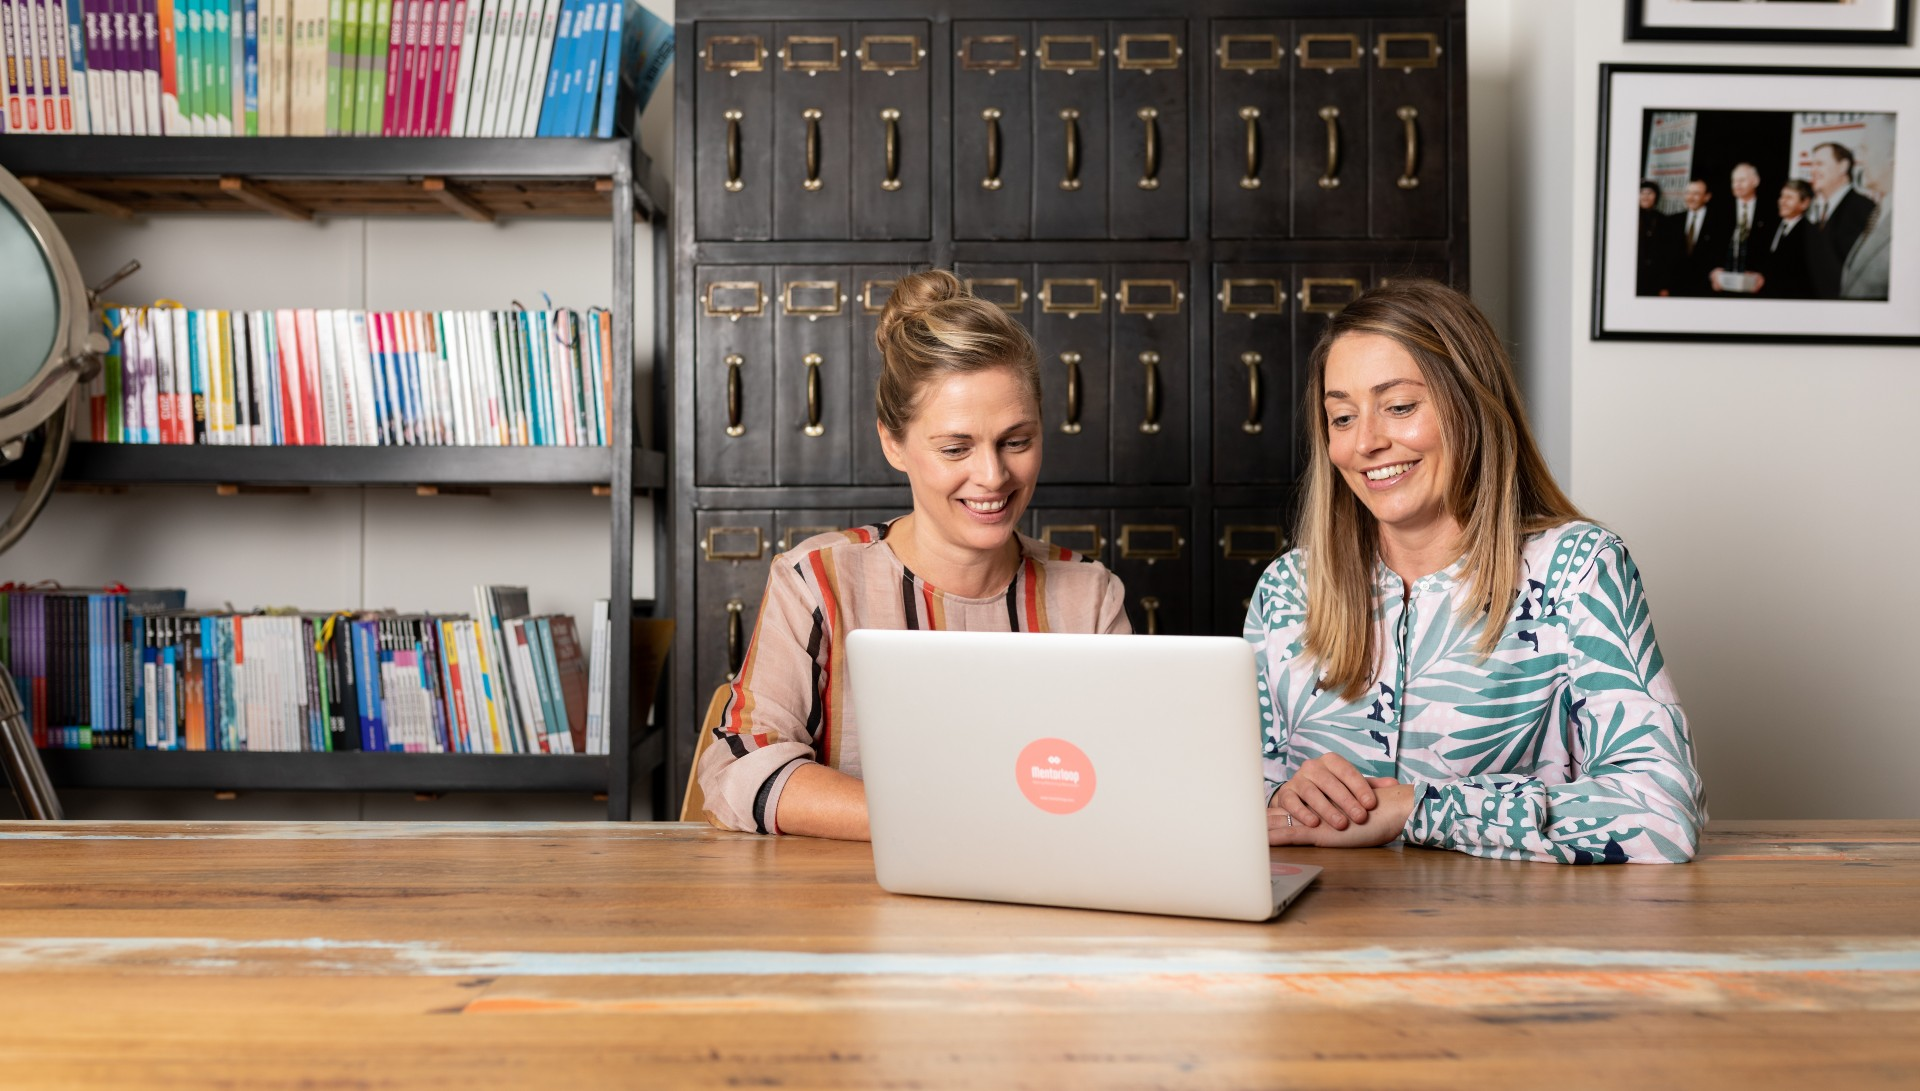 Mentorloop Co-Founders Lucy Lloyd and Heidi Holmes